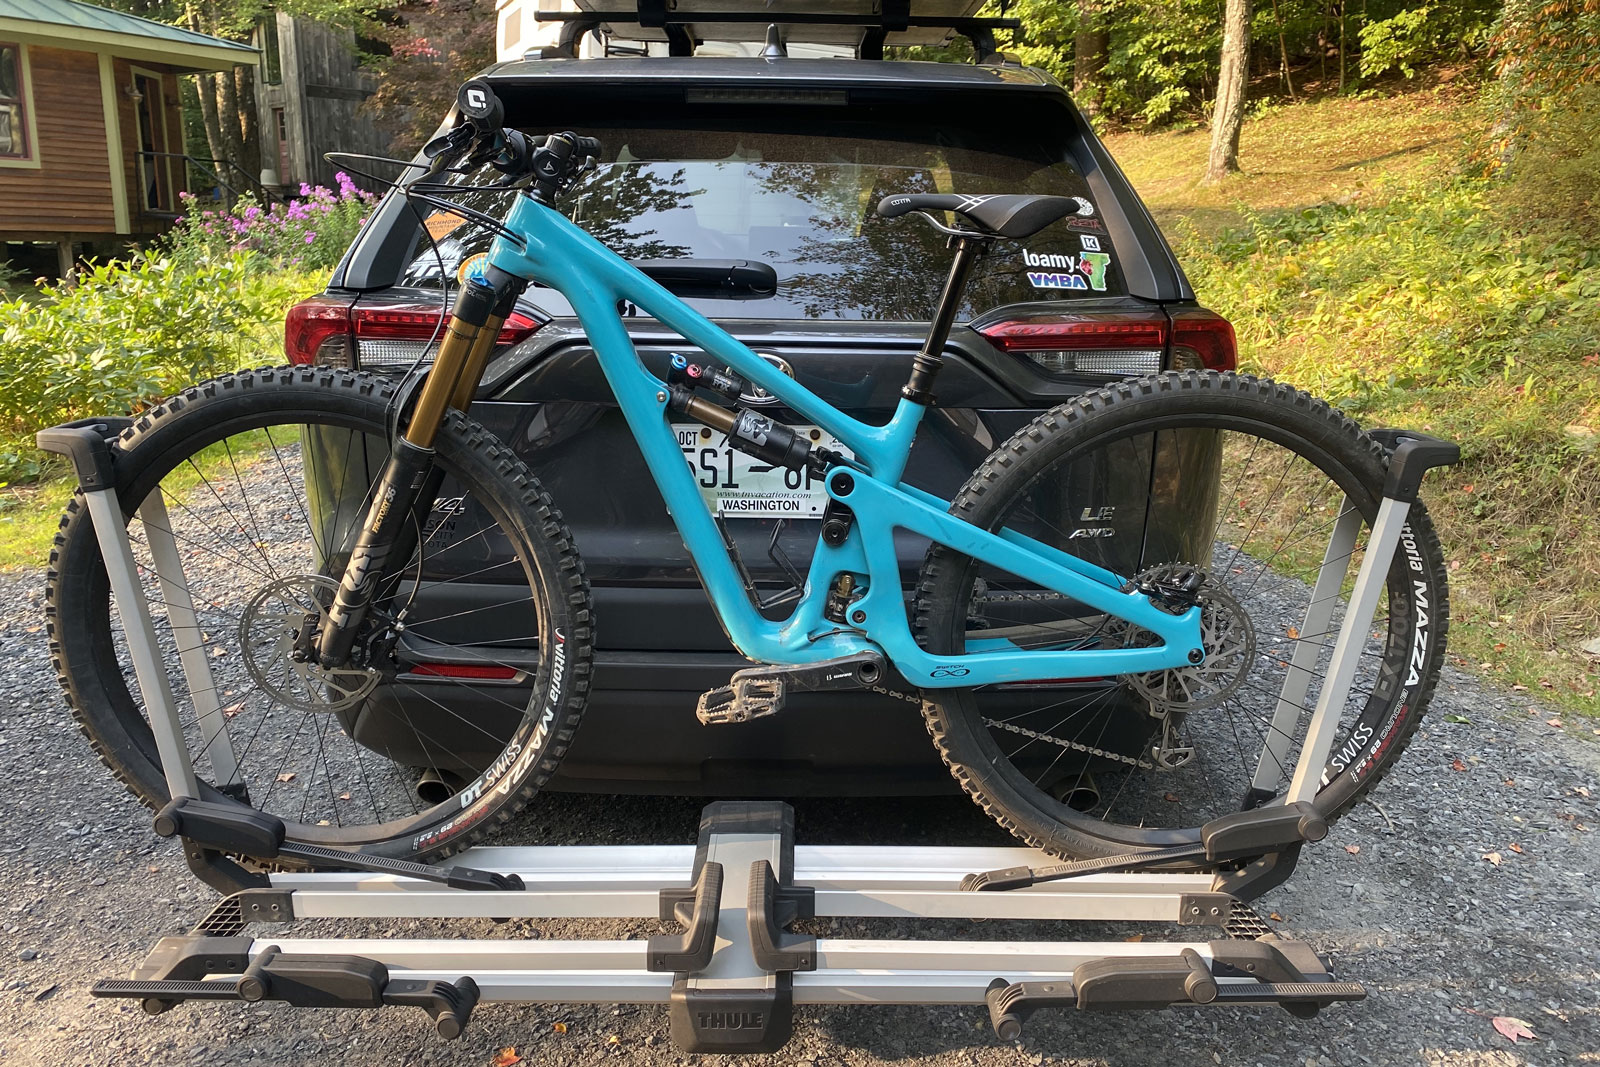 bike rack hitch platform racks thule helium truck lightweight competition gearjunkie 1up aims